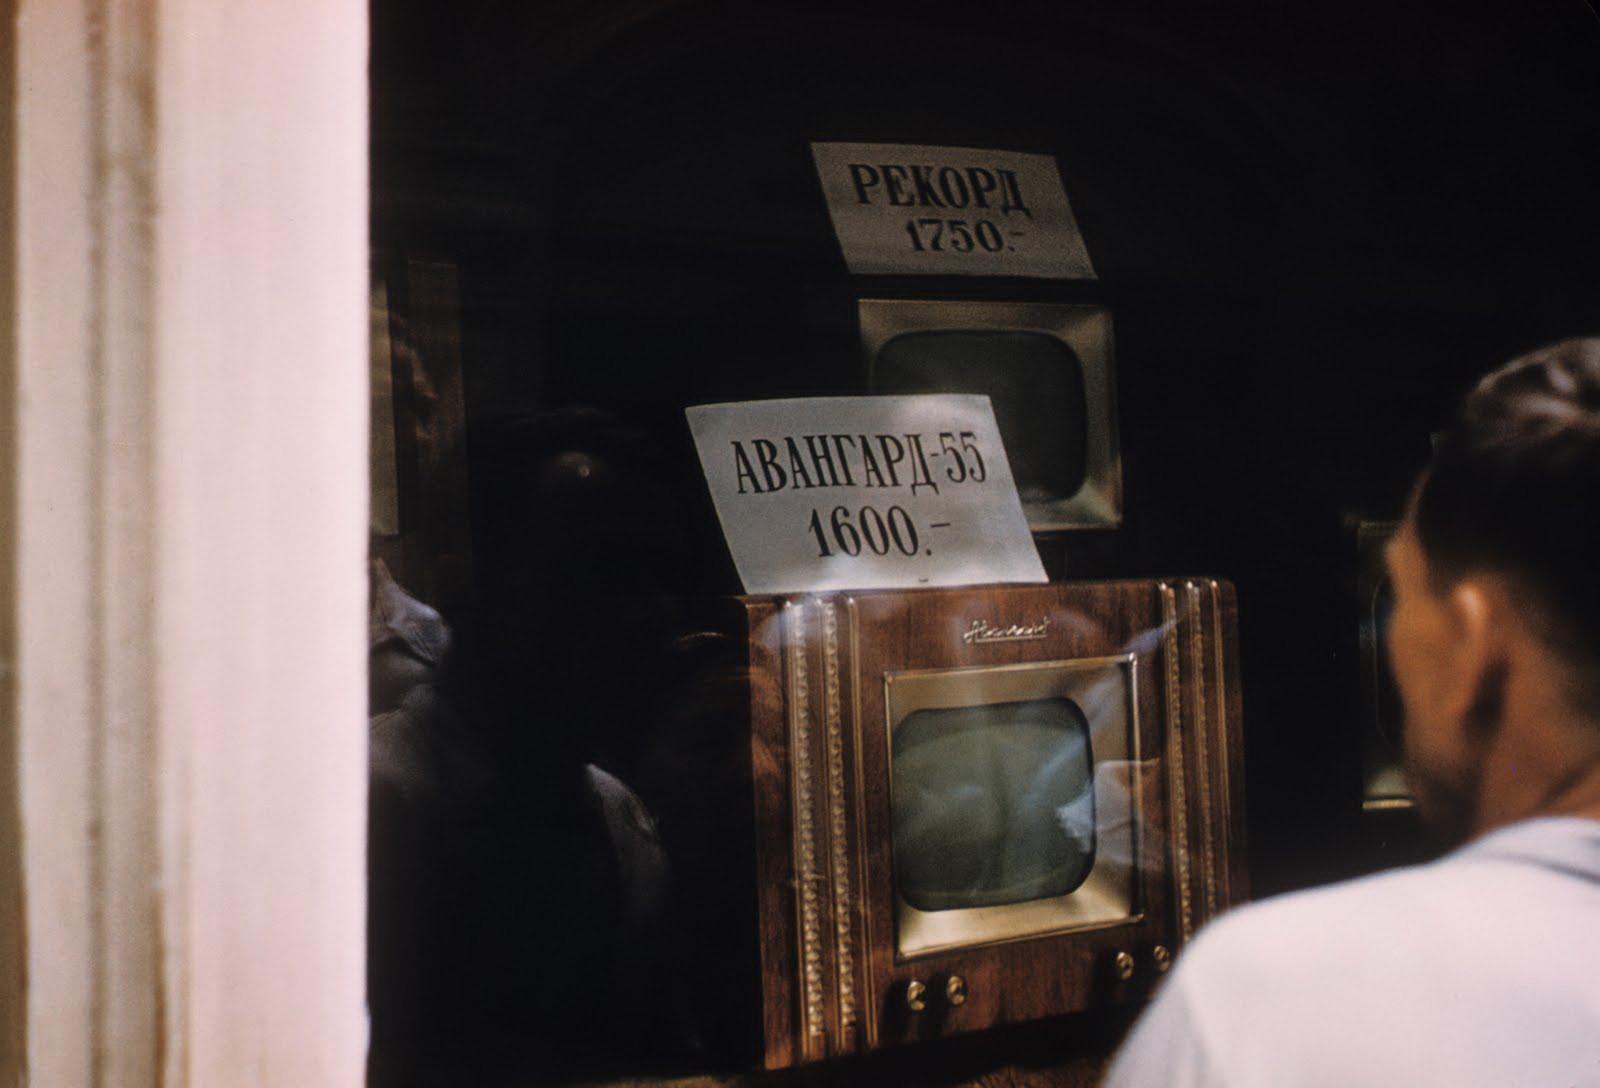 1958 Москва. Телевизор в витрине. John Shultz